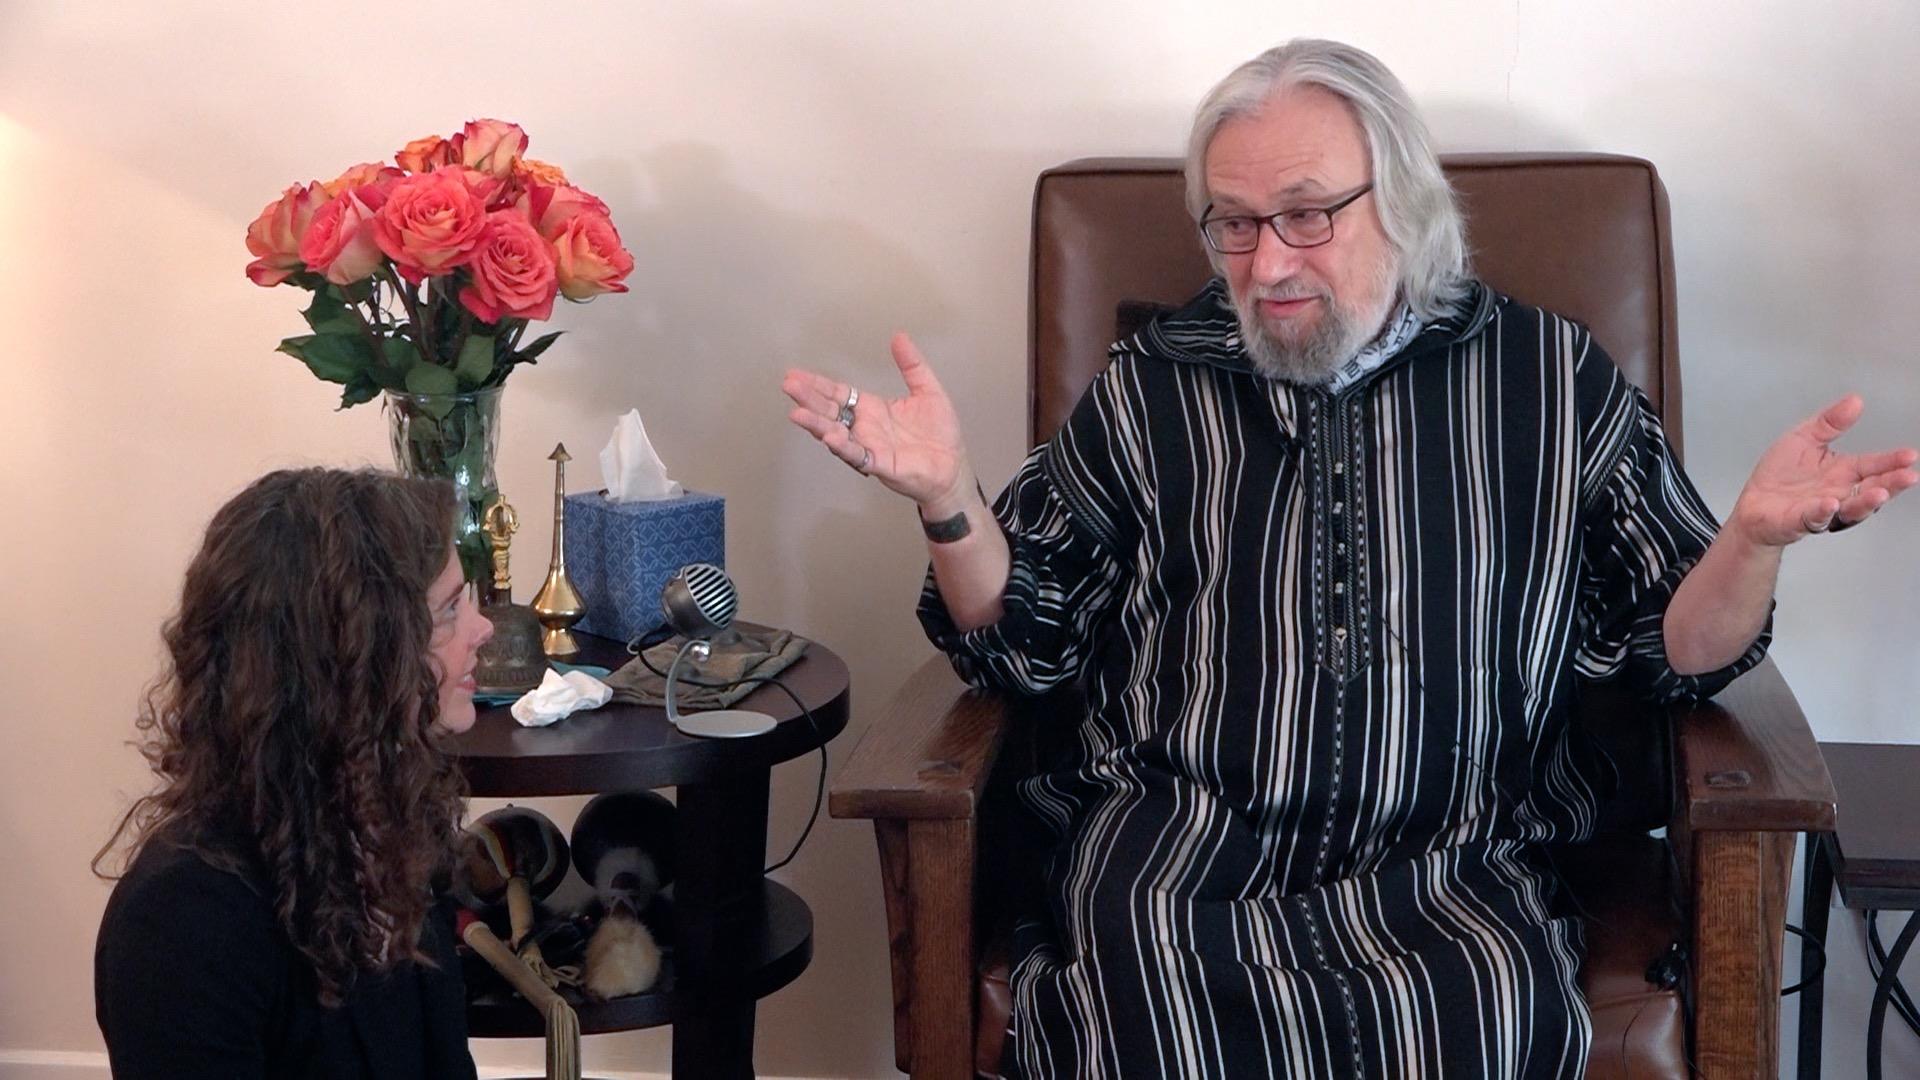 17-February-2018 Satsang with Swami Premodaya 9 2.jpg